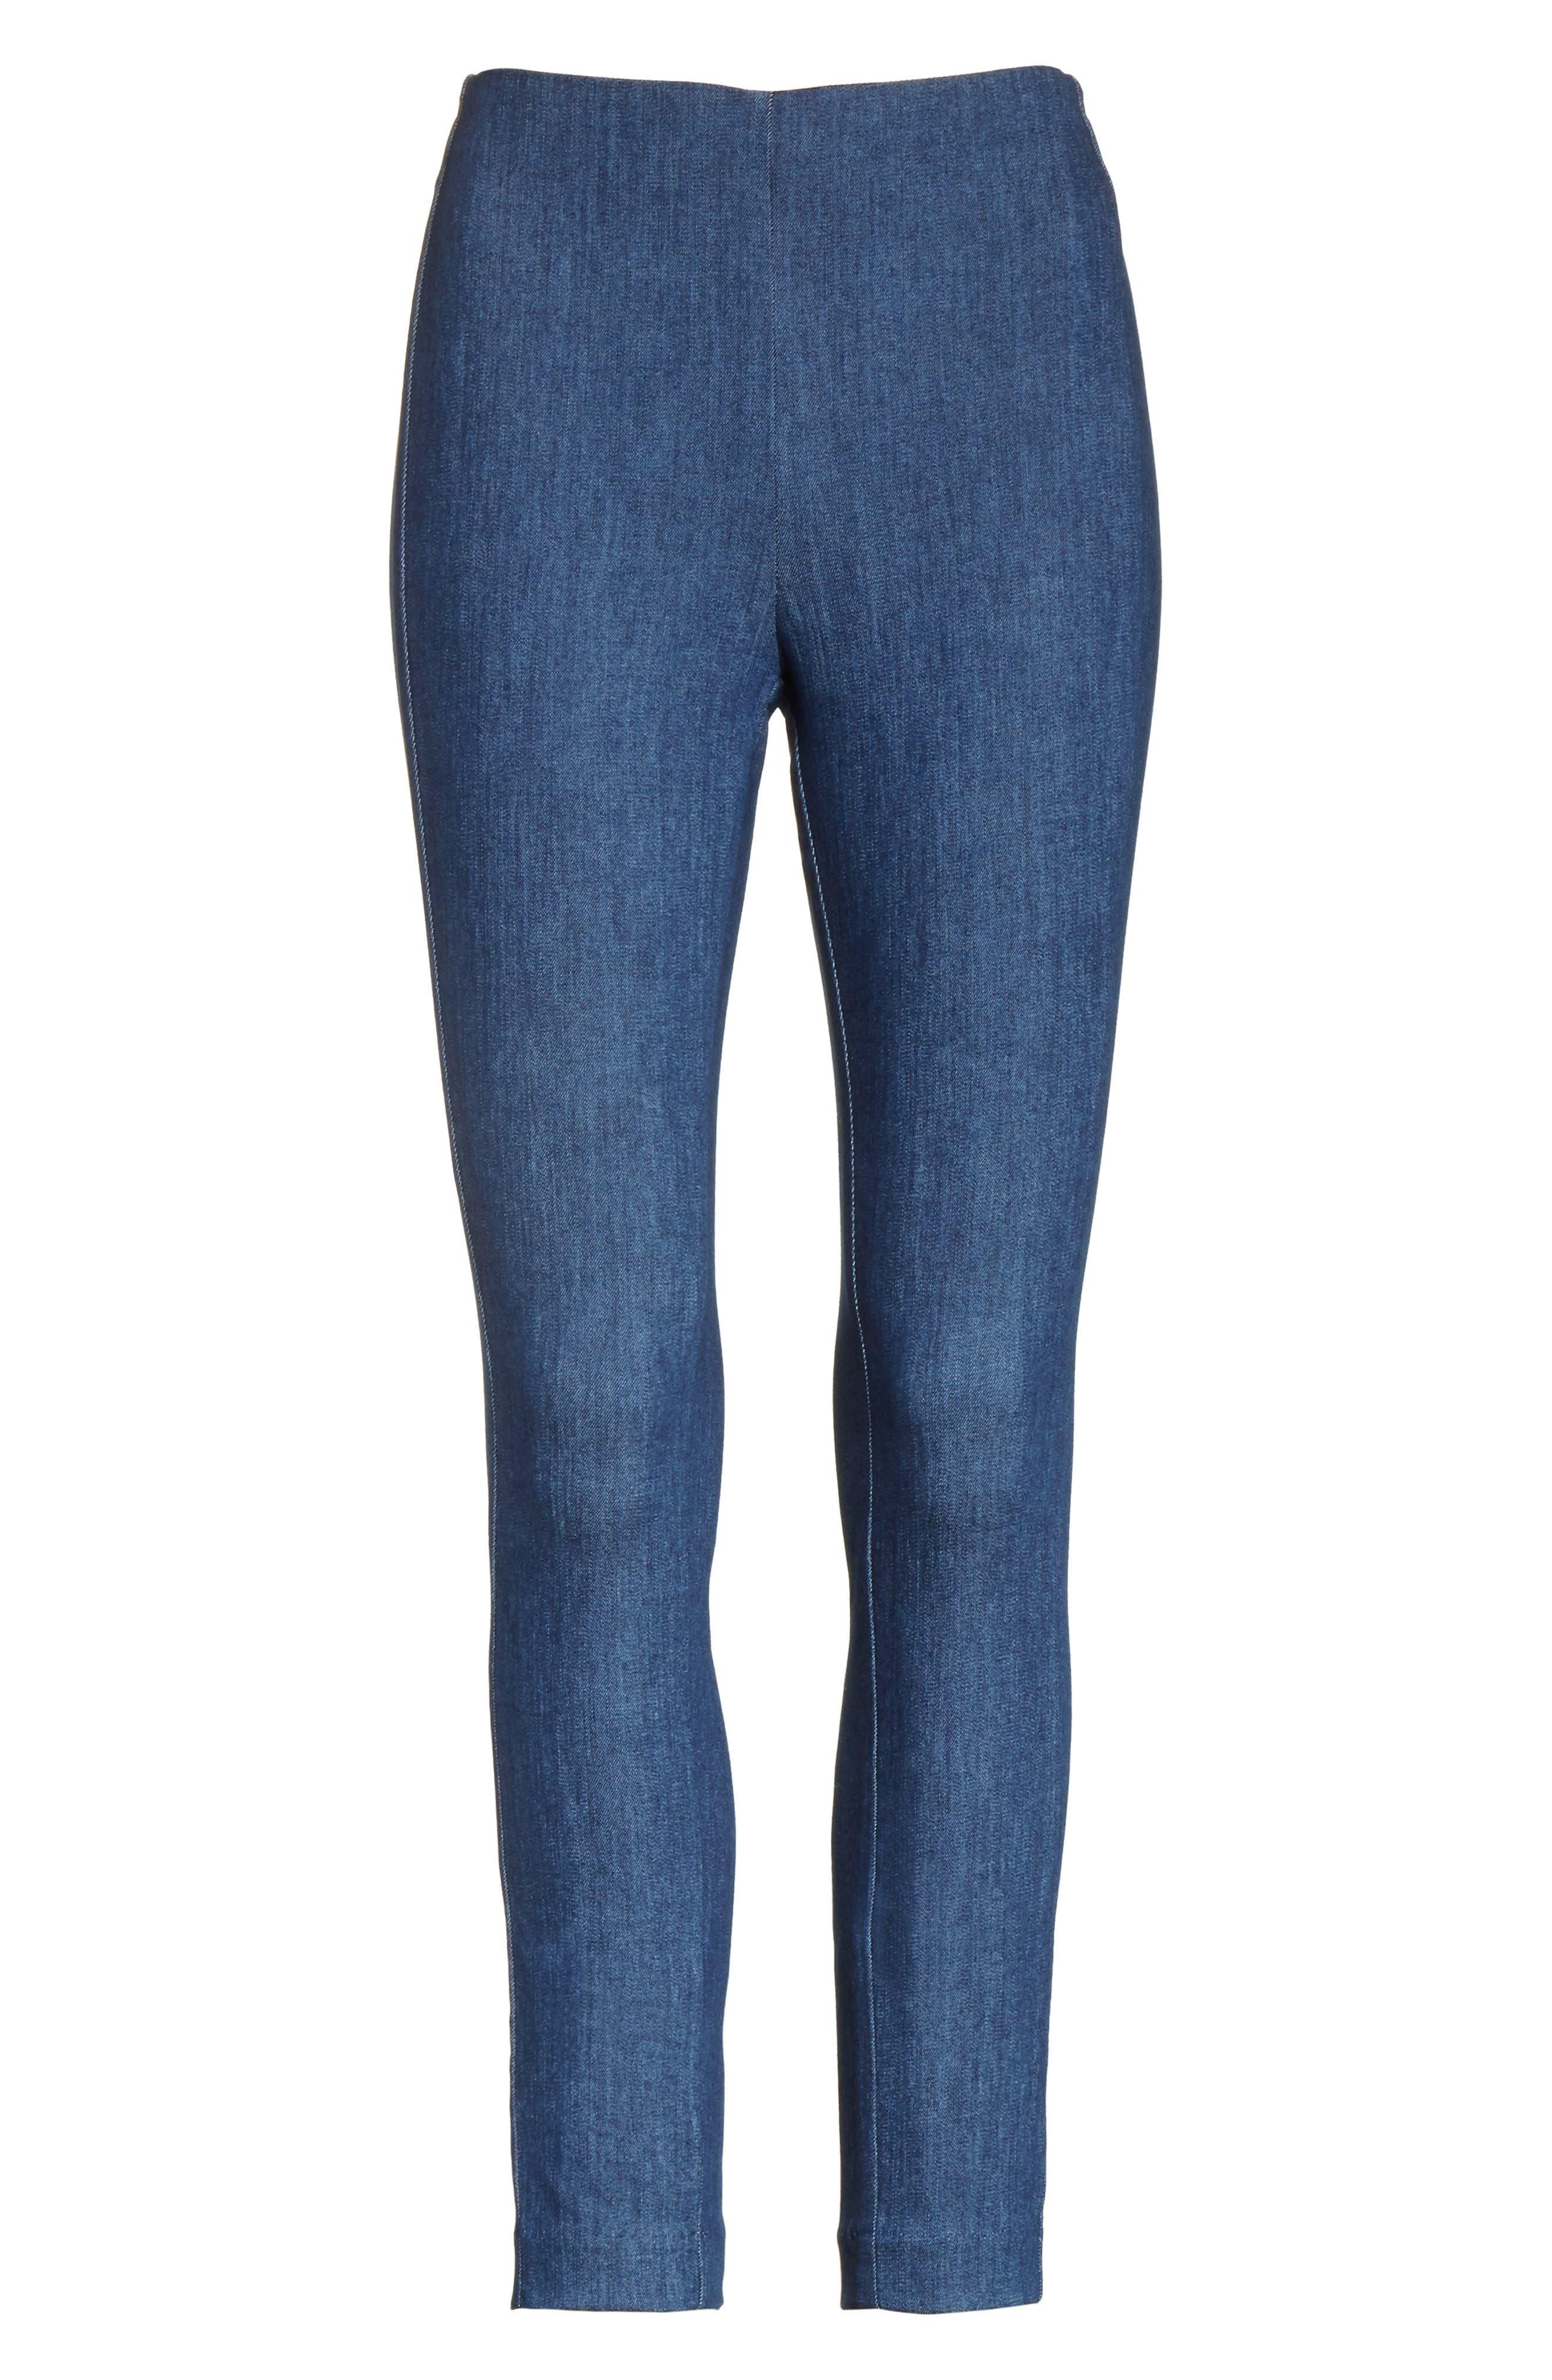 Simone Slim Ankle Pants,                             Alternate thumbnail 6, color,                             420